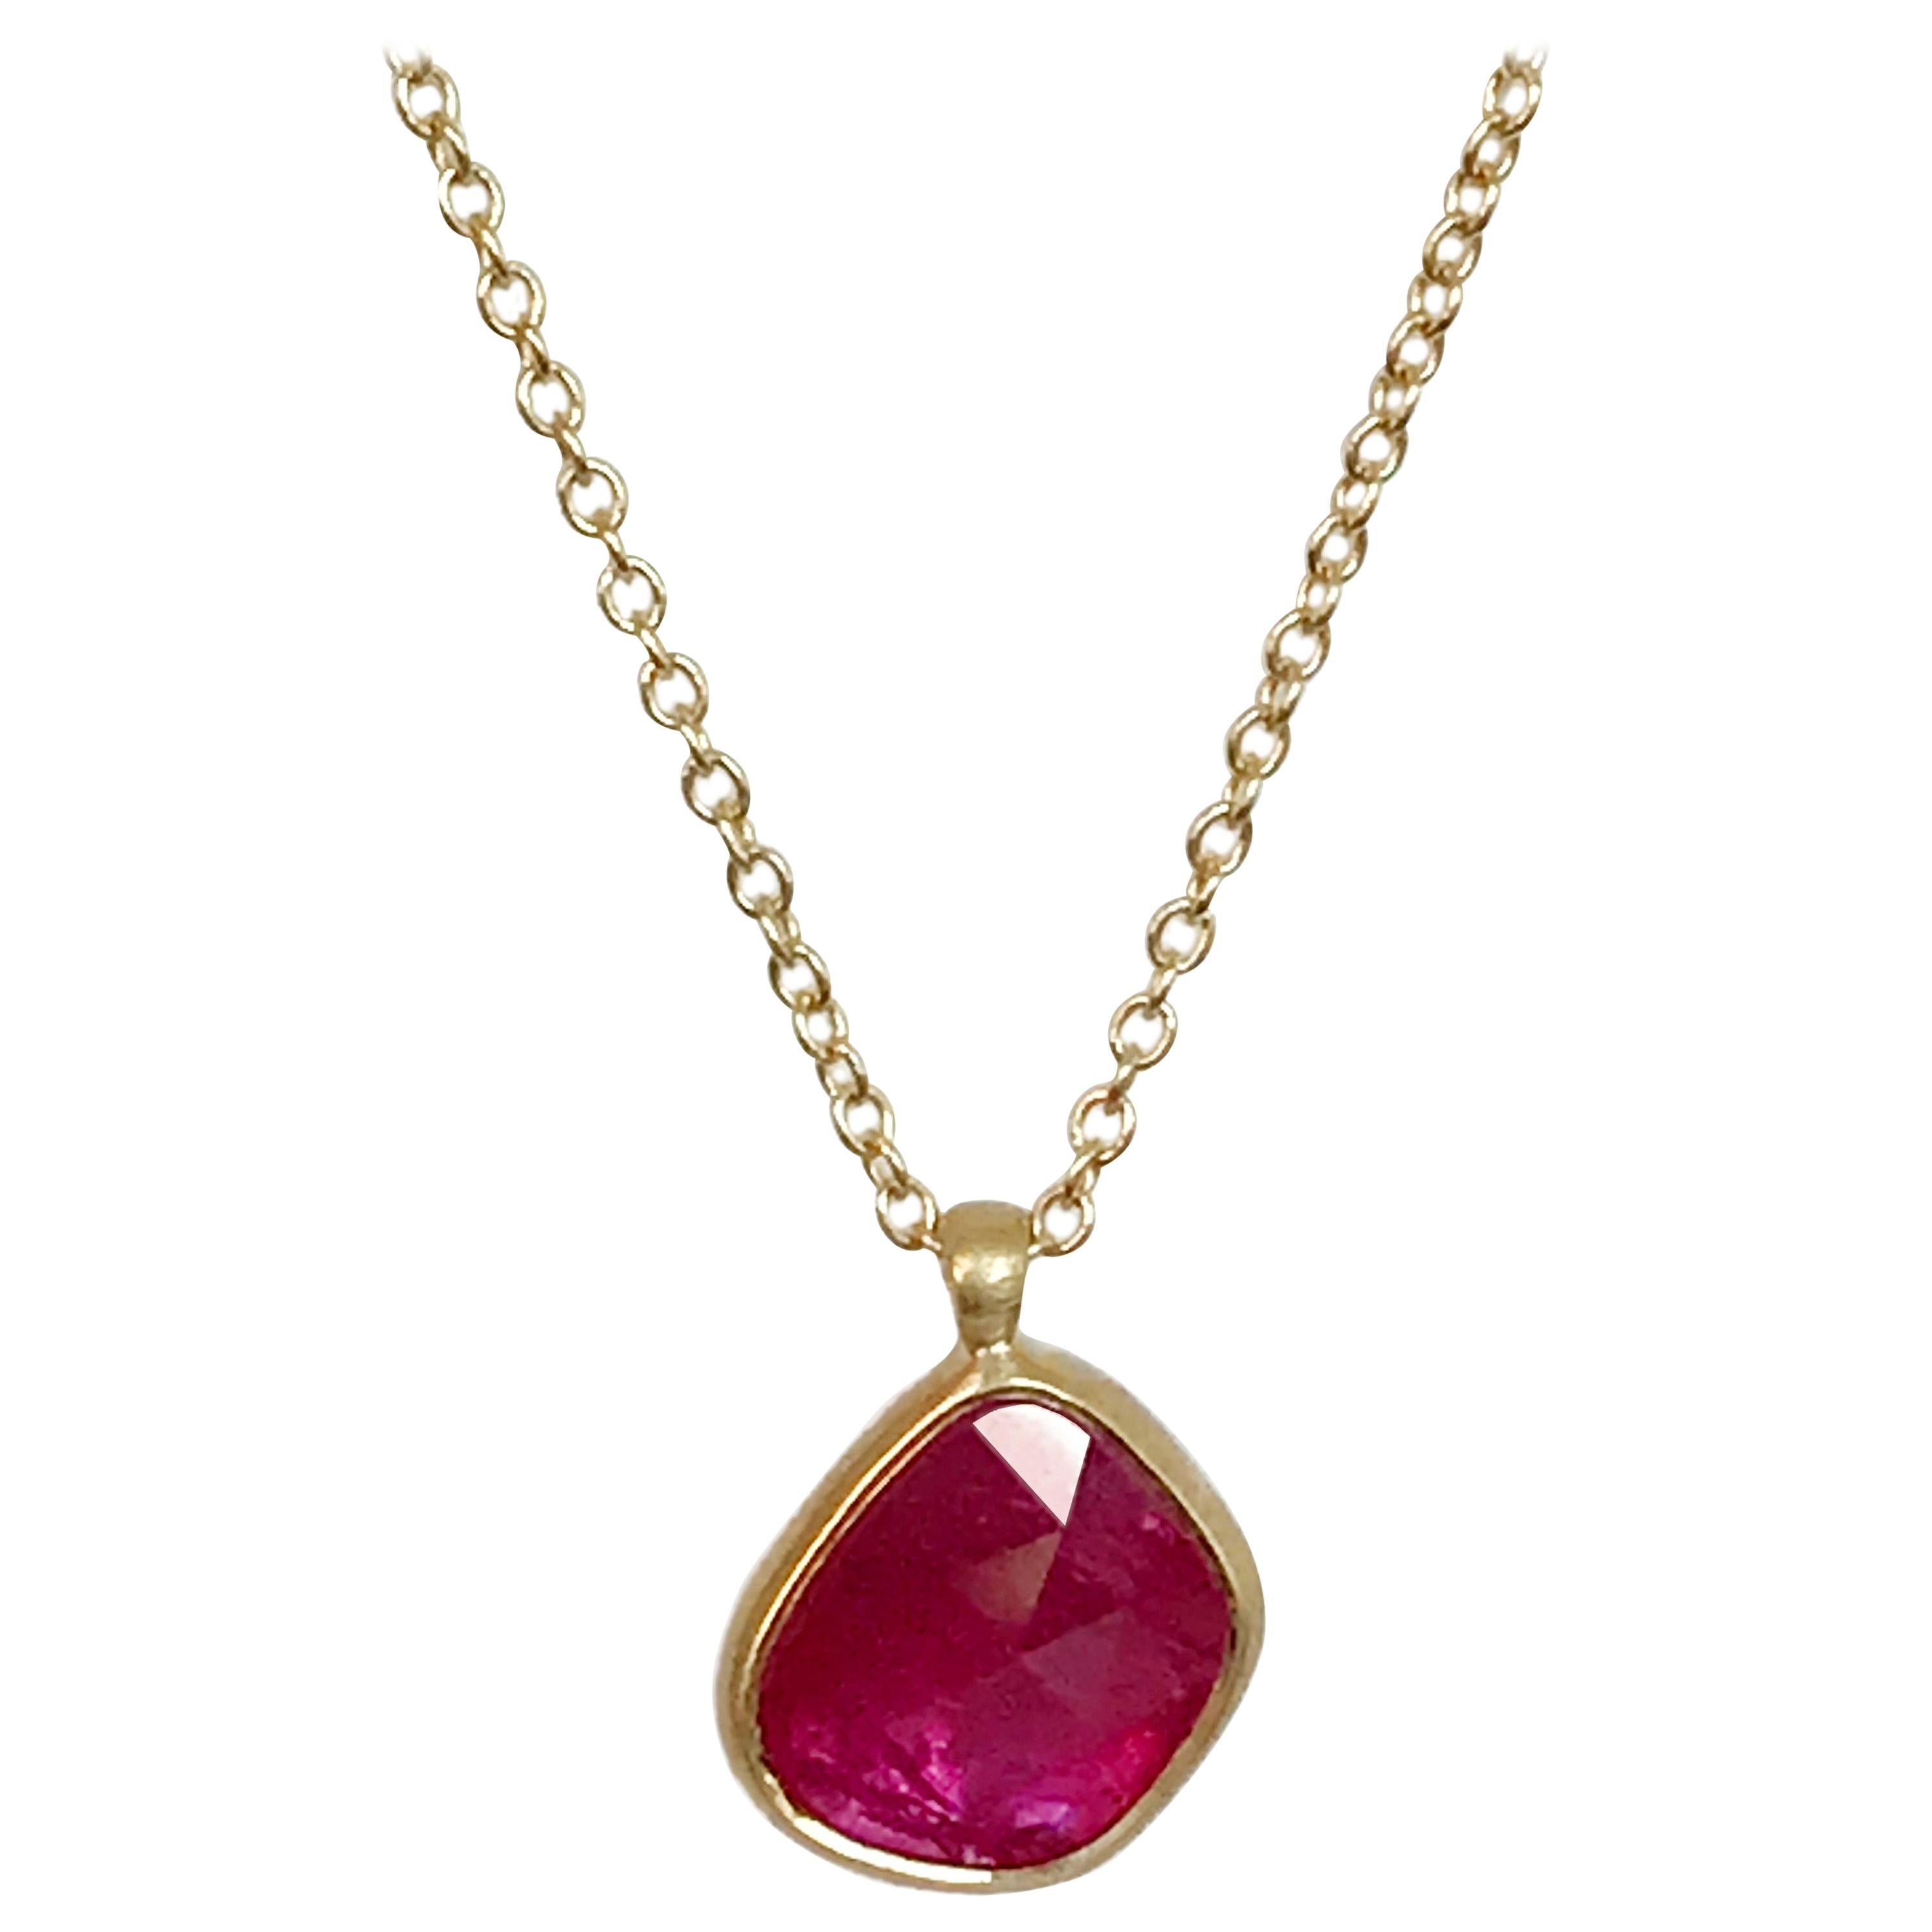 Dalben Design Irregular Drop Shape Rose Cut Slice Ruby Yellow Gold Necklace